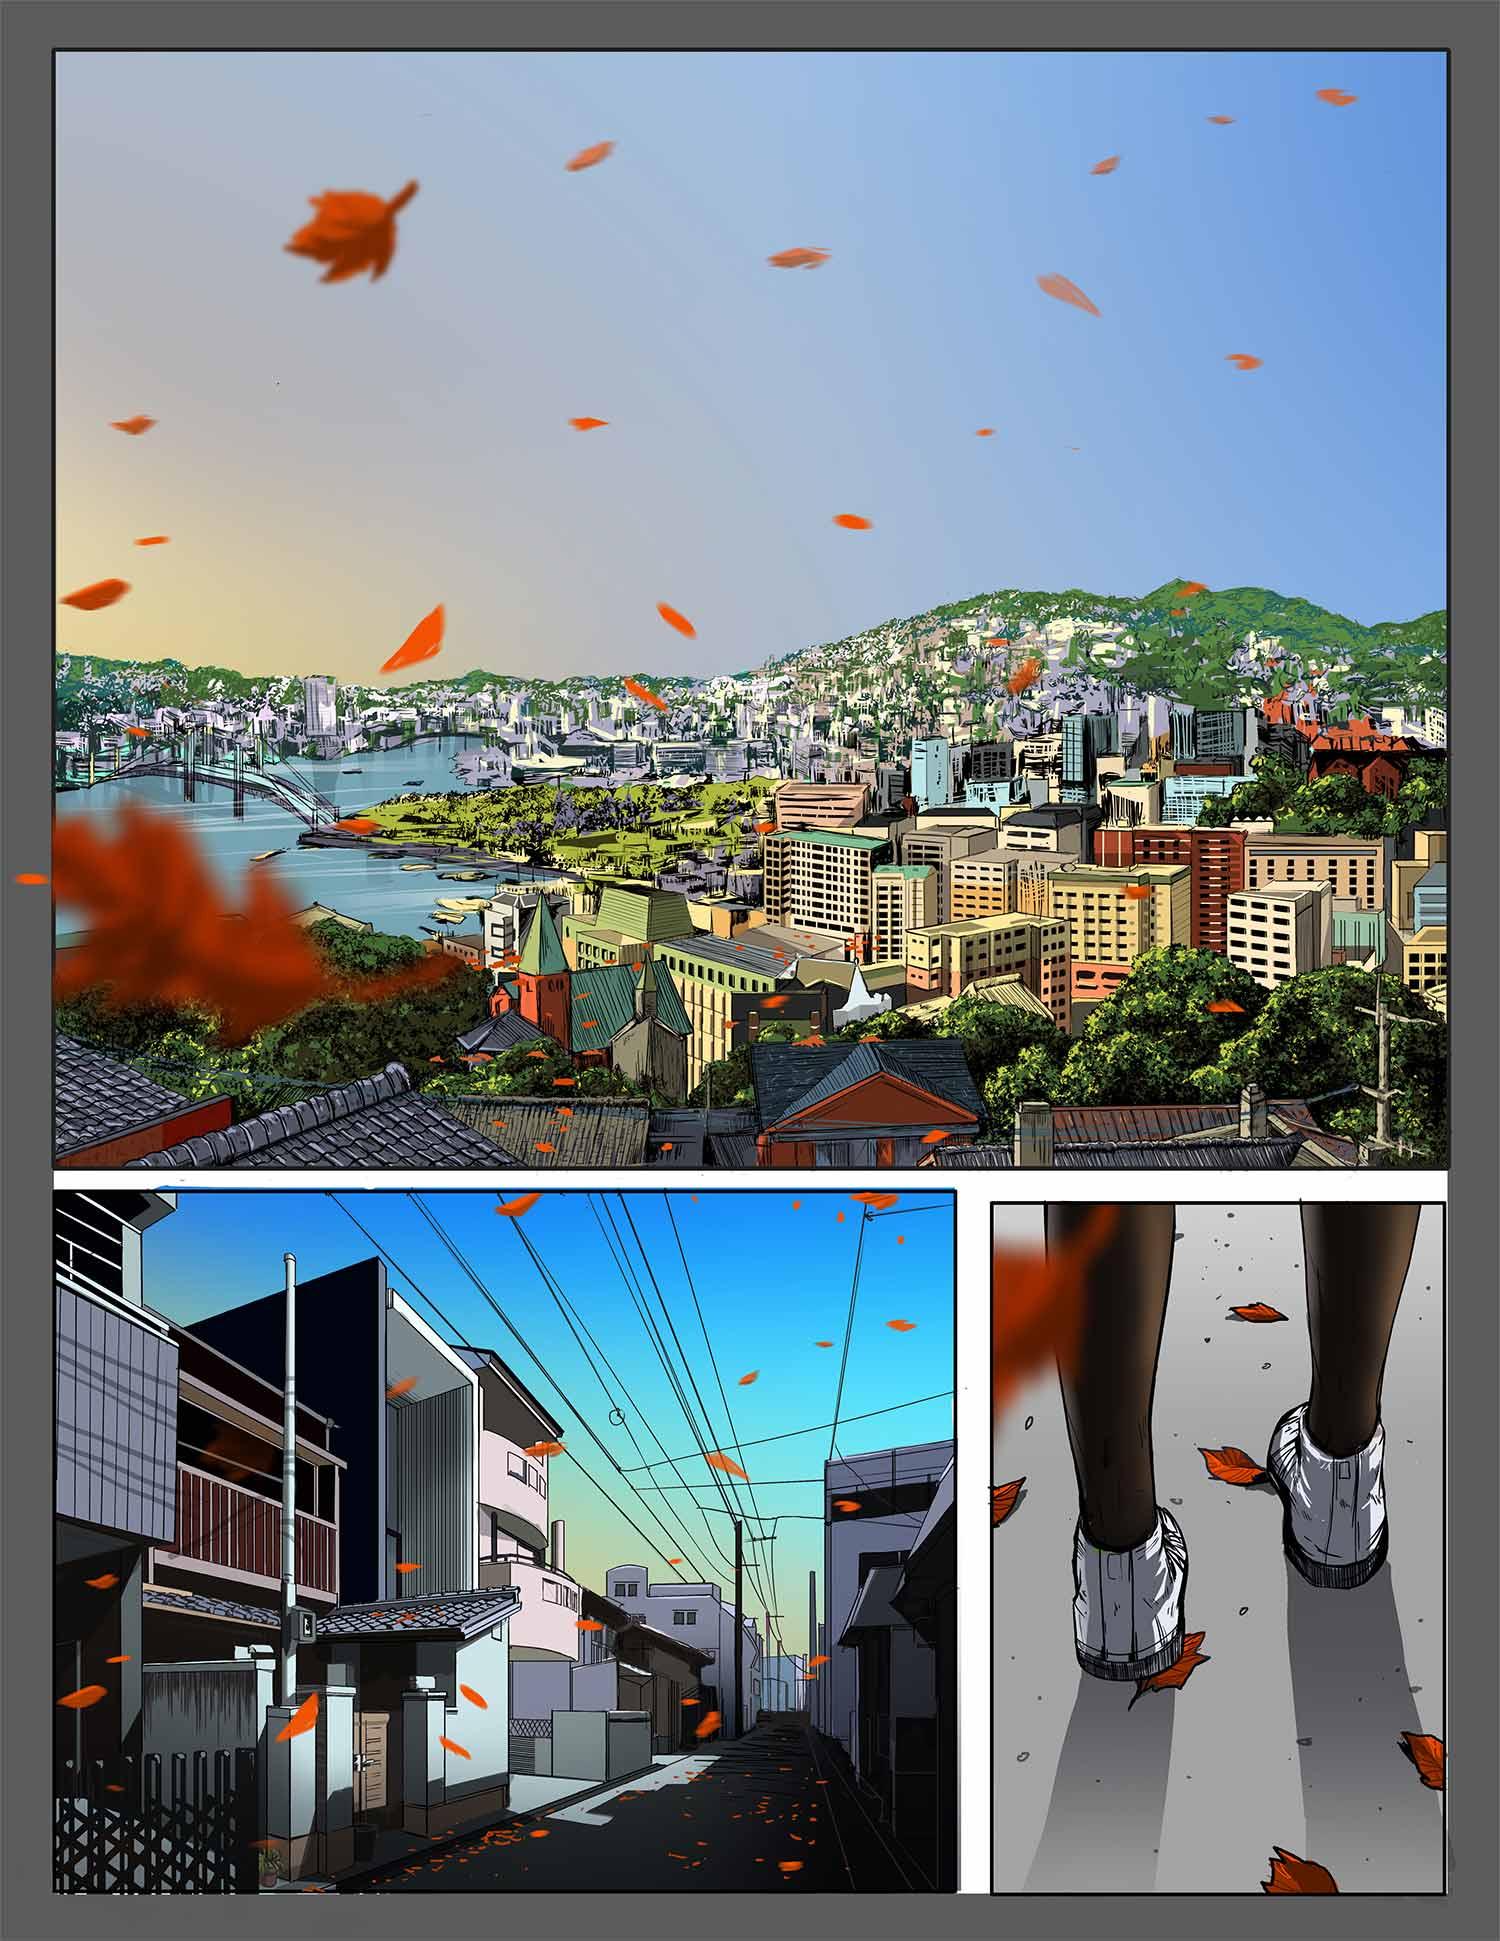 ashcan-digital-works-167-01.jpg